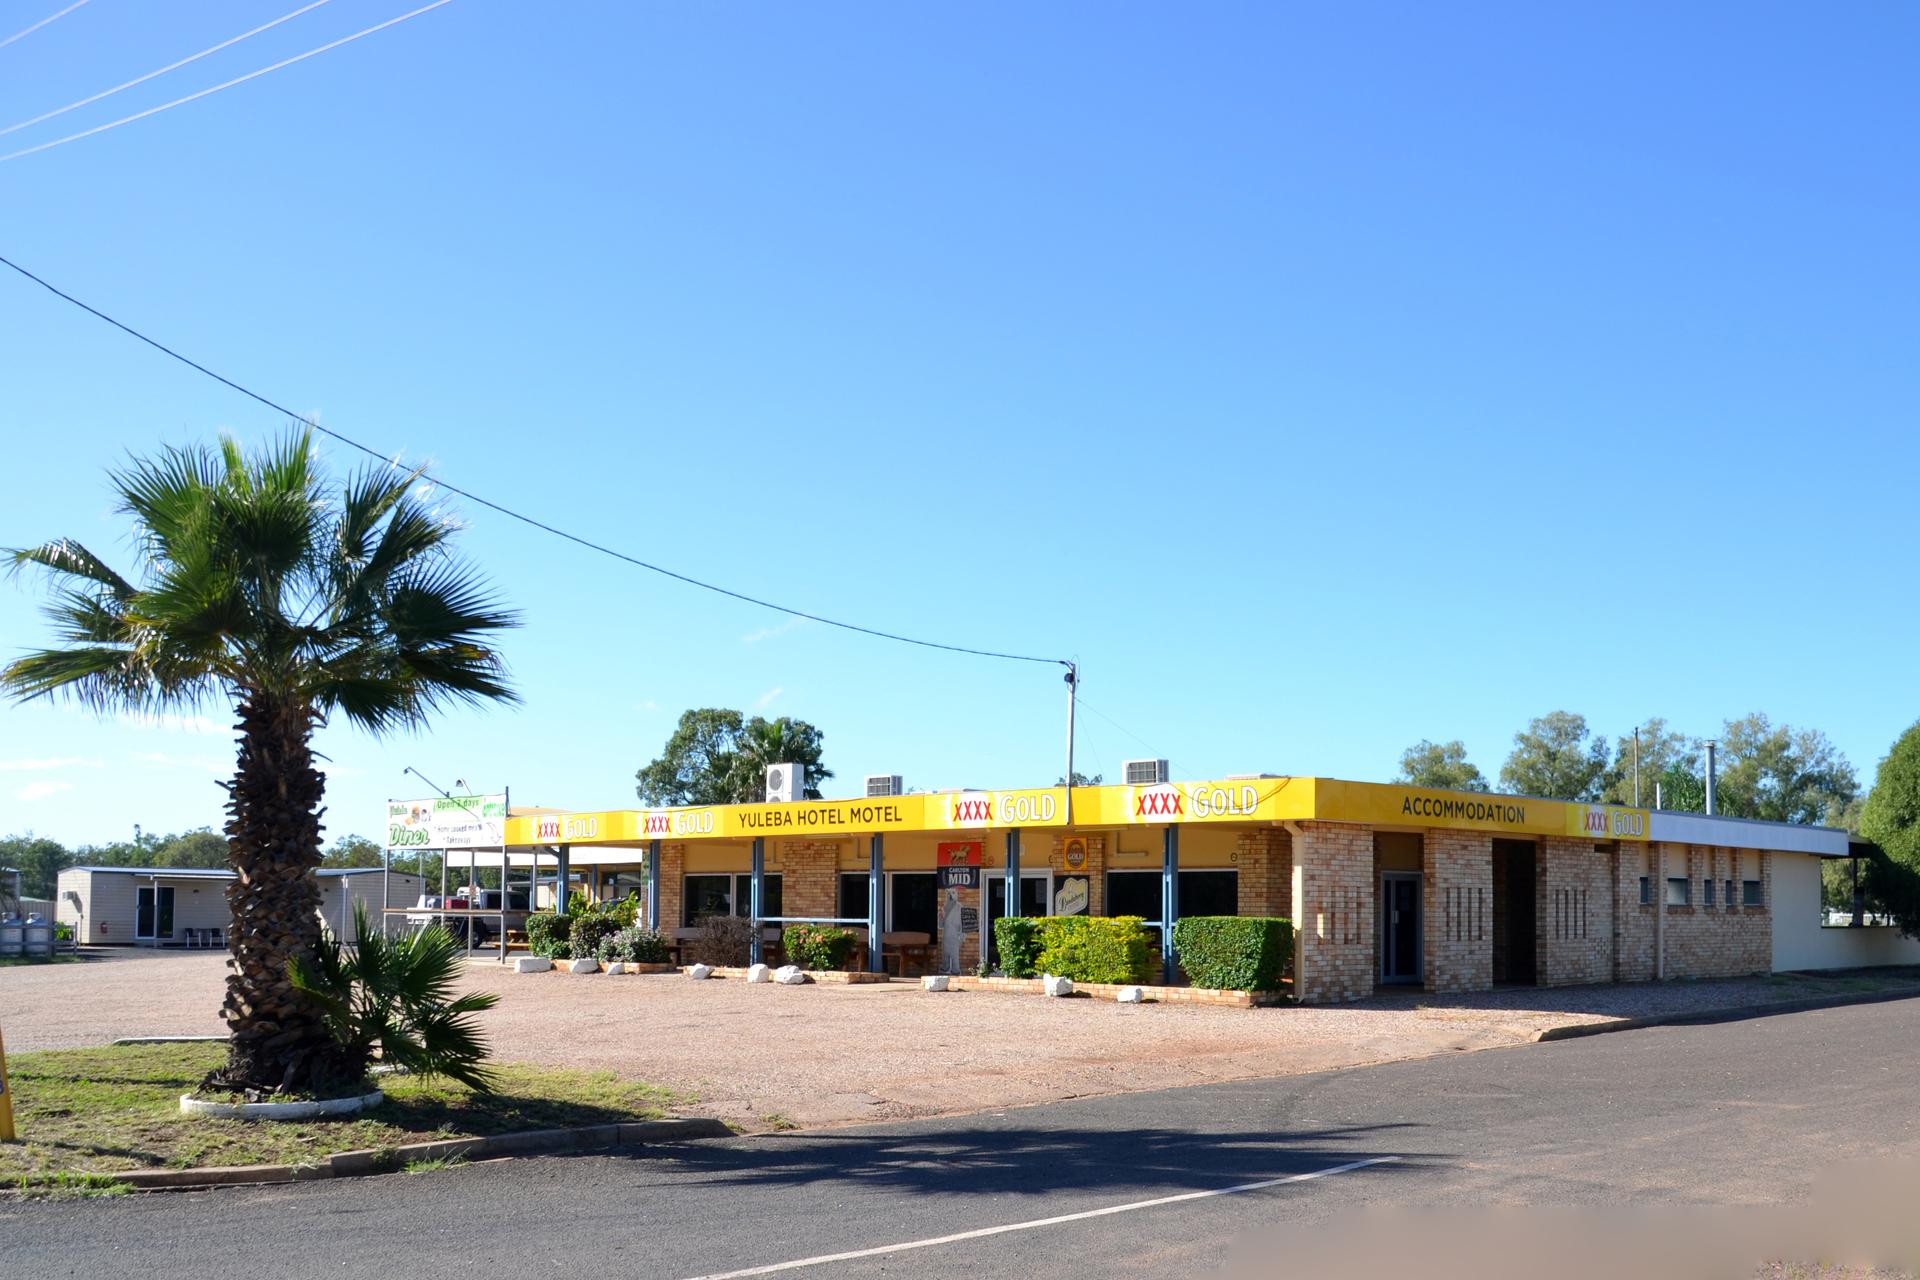 g - Yuleba Hotel Motel and Diner